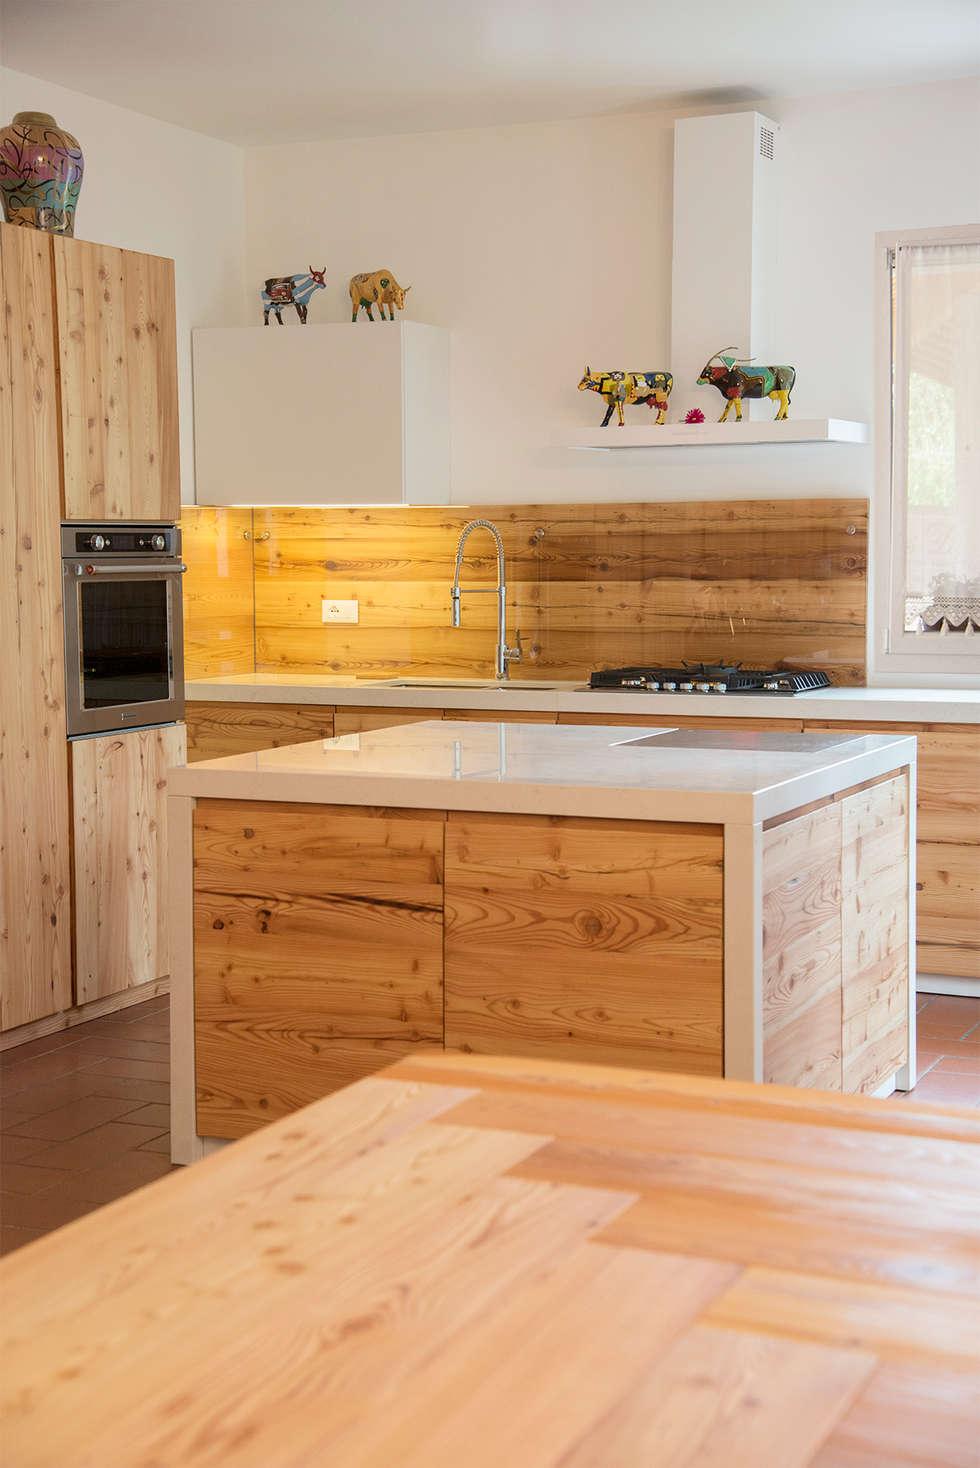 Cucina su misura in larice antico: cucina in stile in stile rustico ...